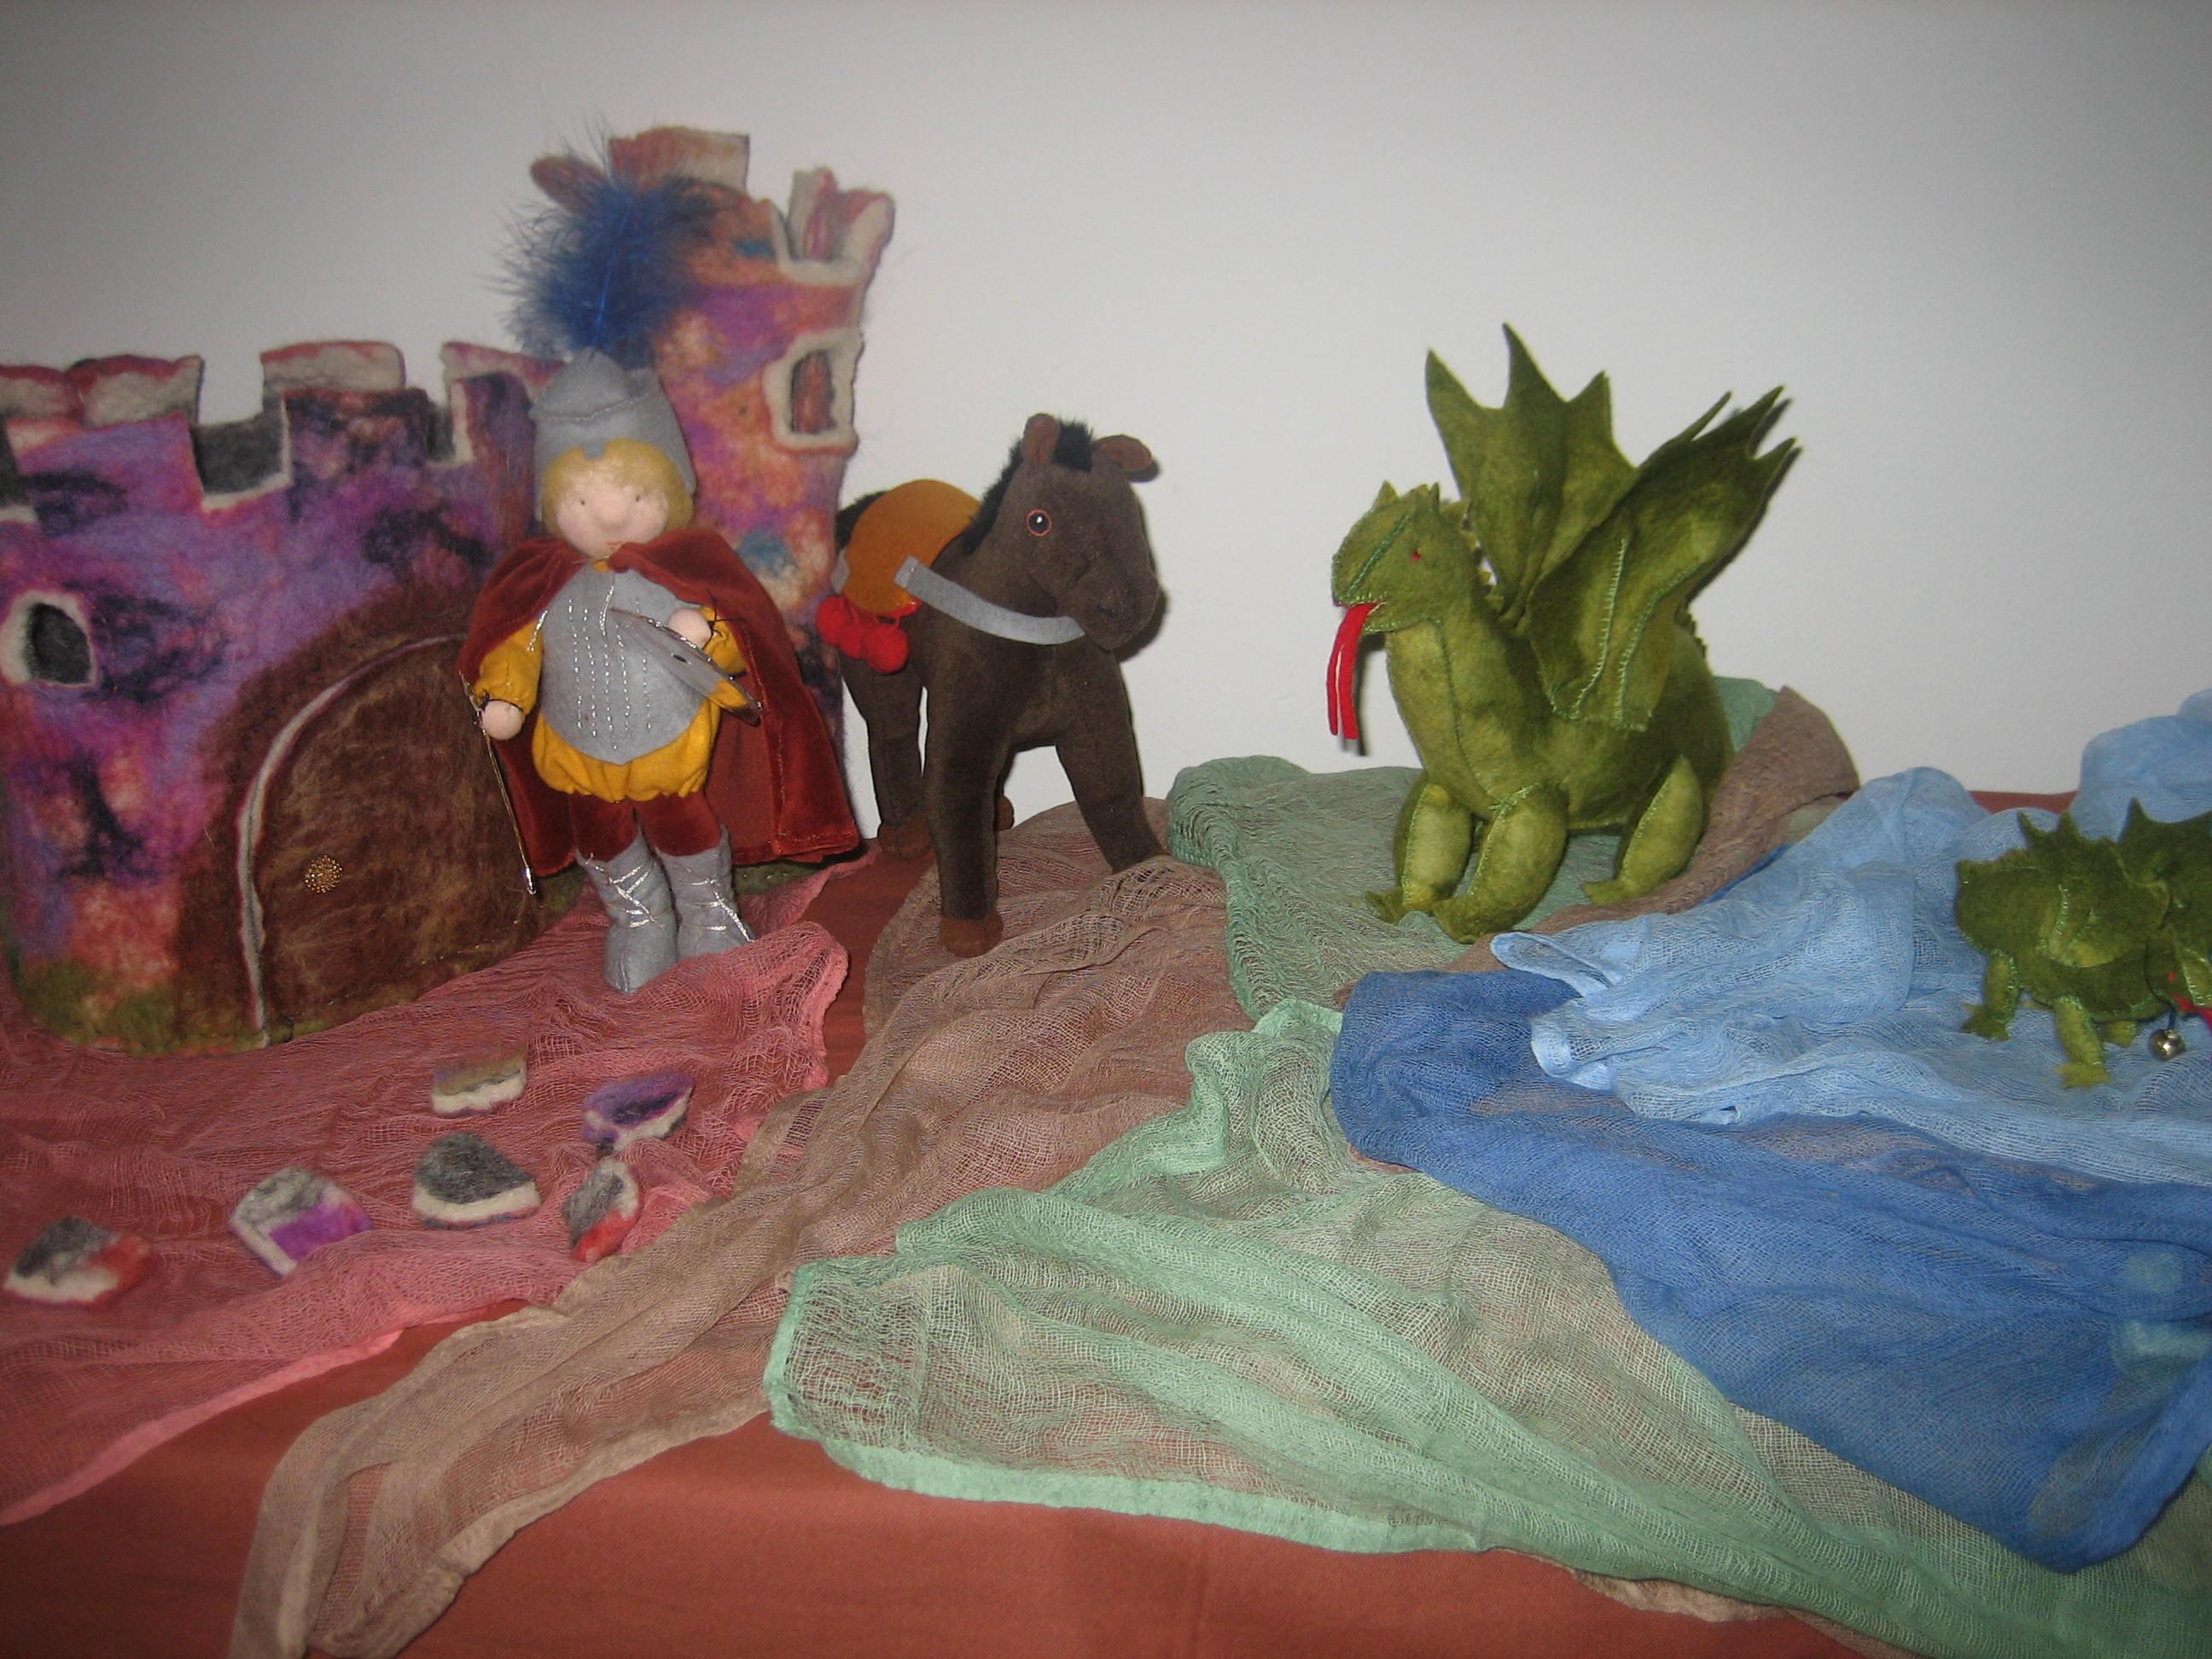 fotoos ridder en de draak 001